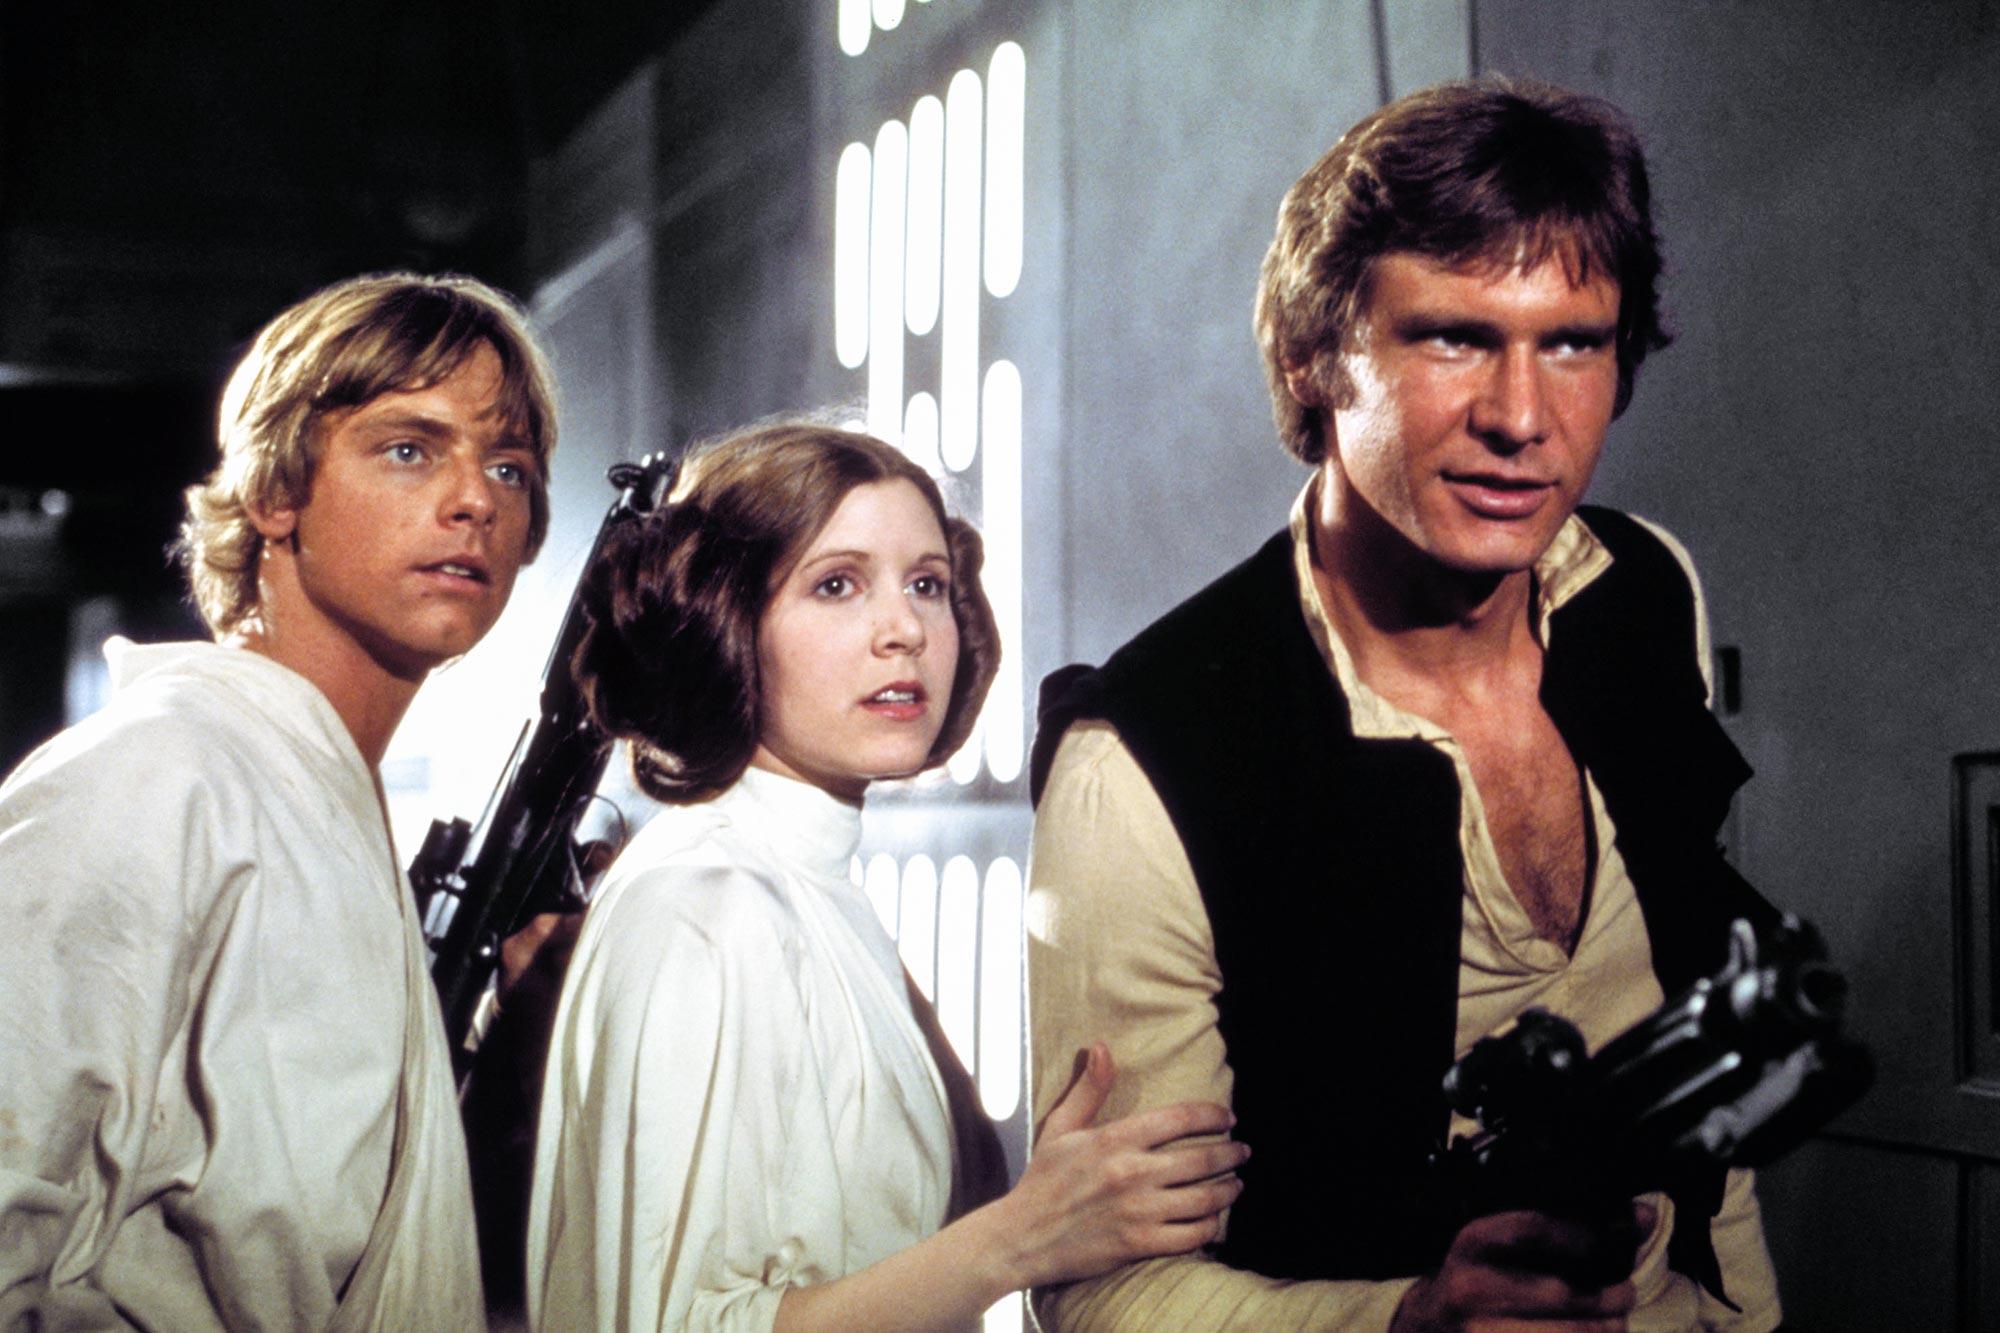 Star Wars Ranking Star Wars: Episode IV - A New Hope